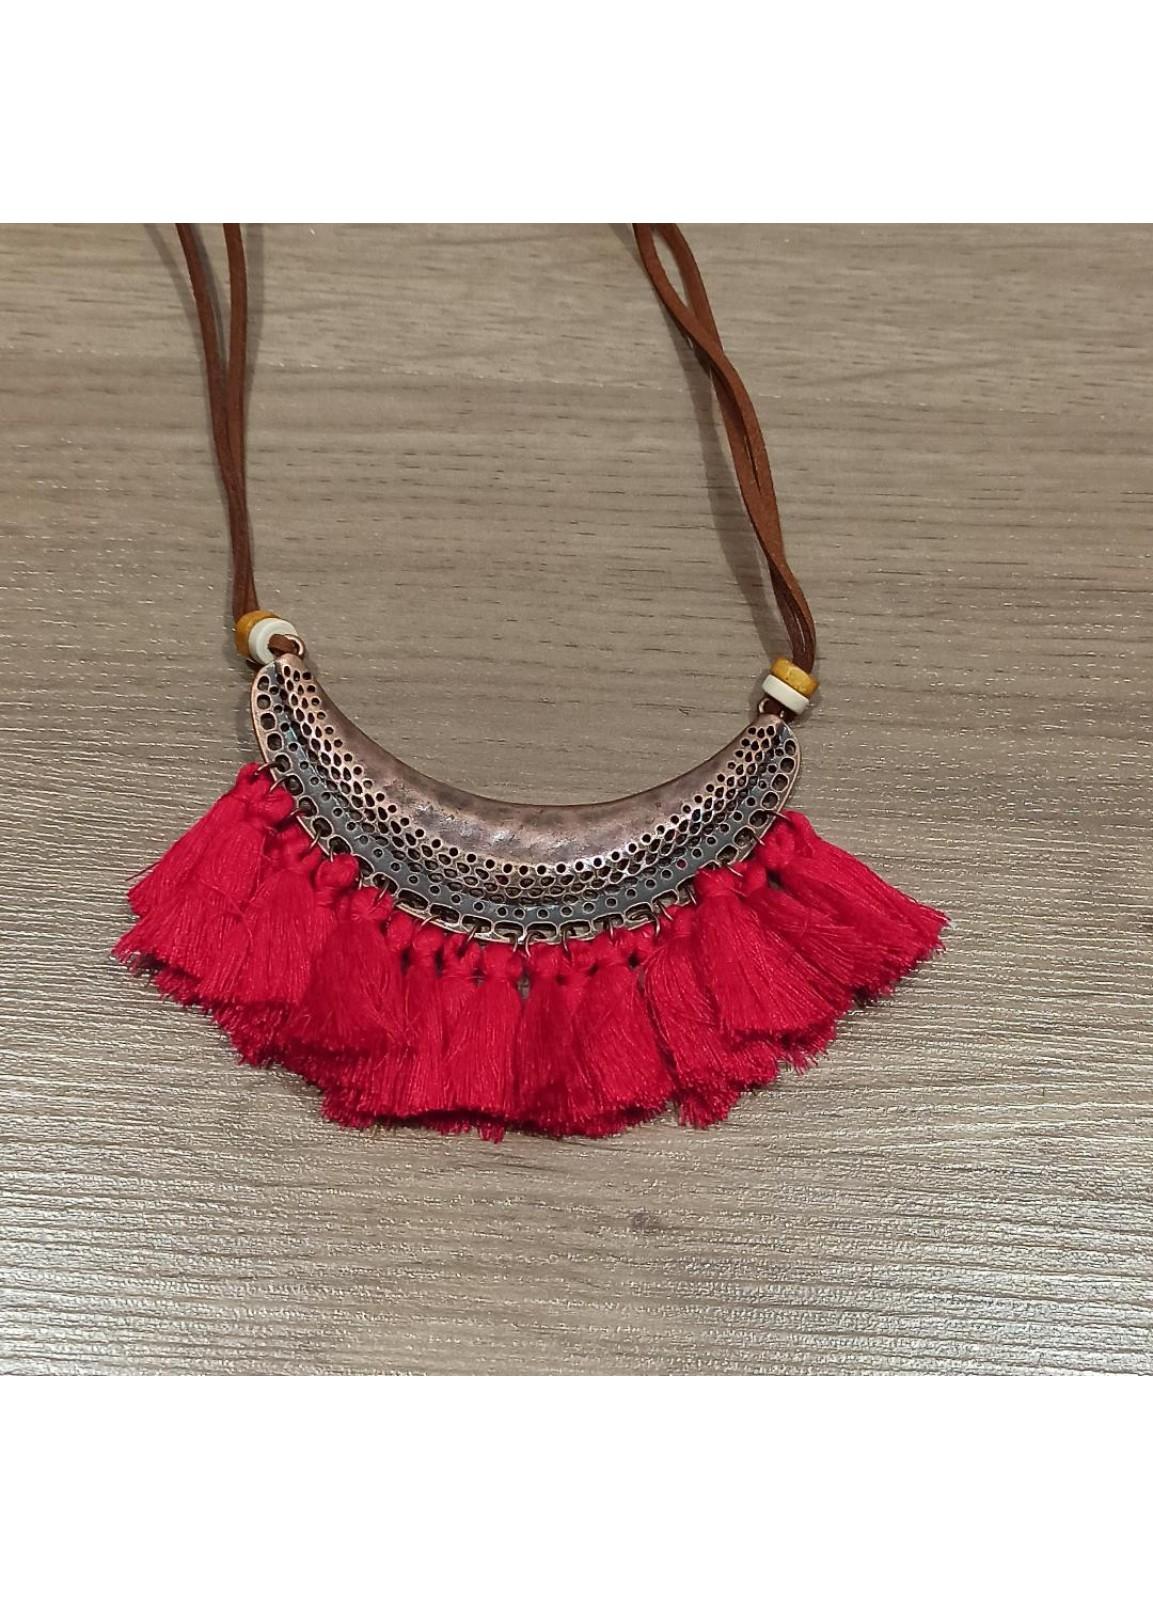 Boho Red Necklace